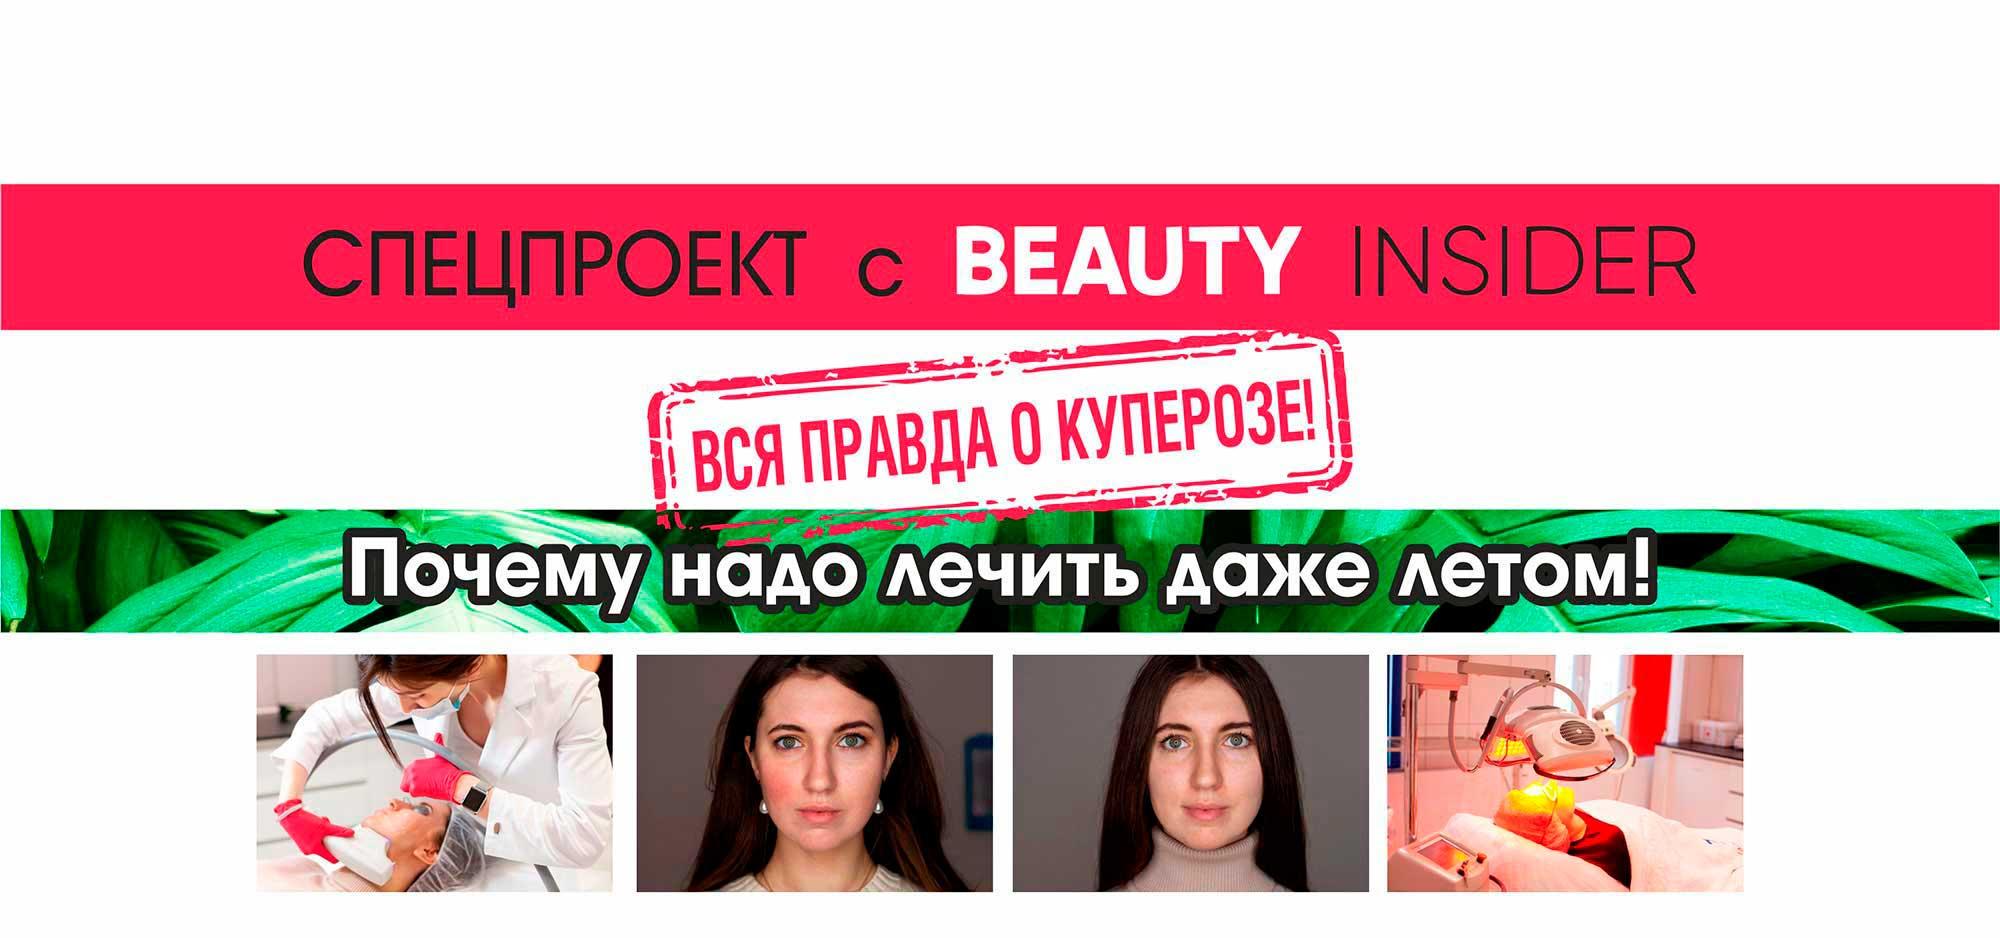 Спецпроект с BEAUTYINSIDER